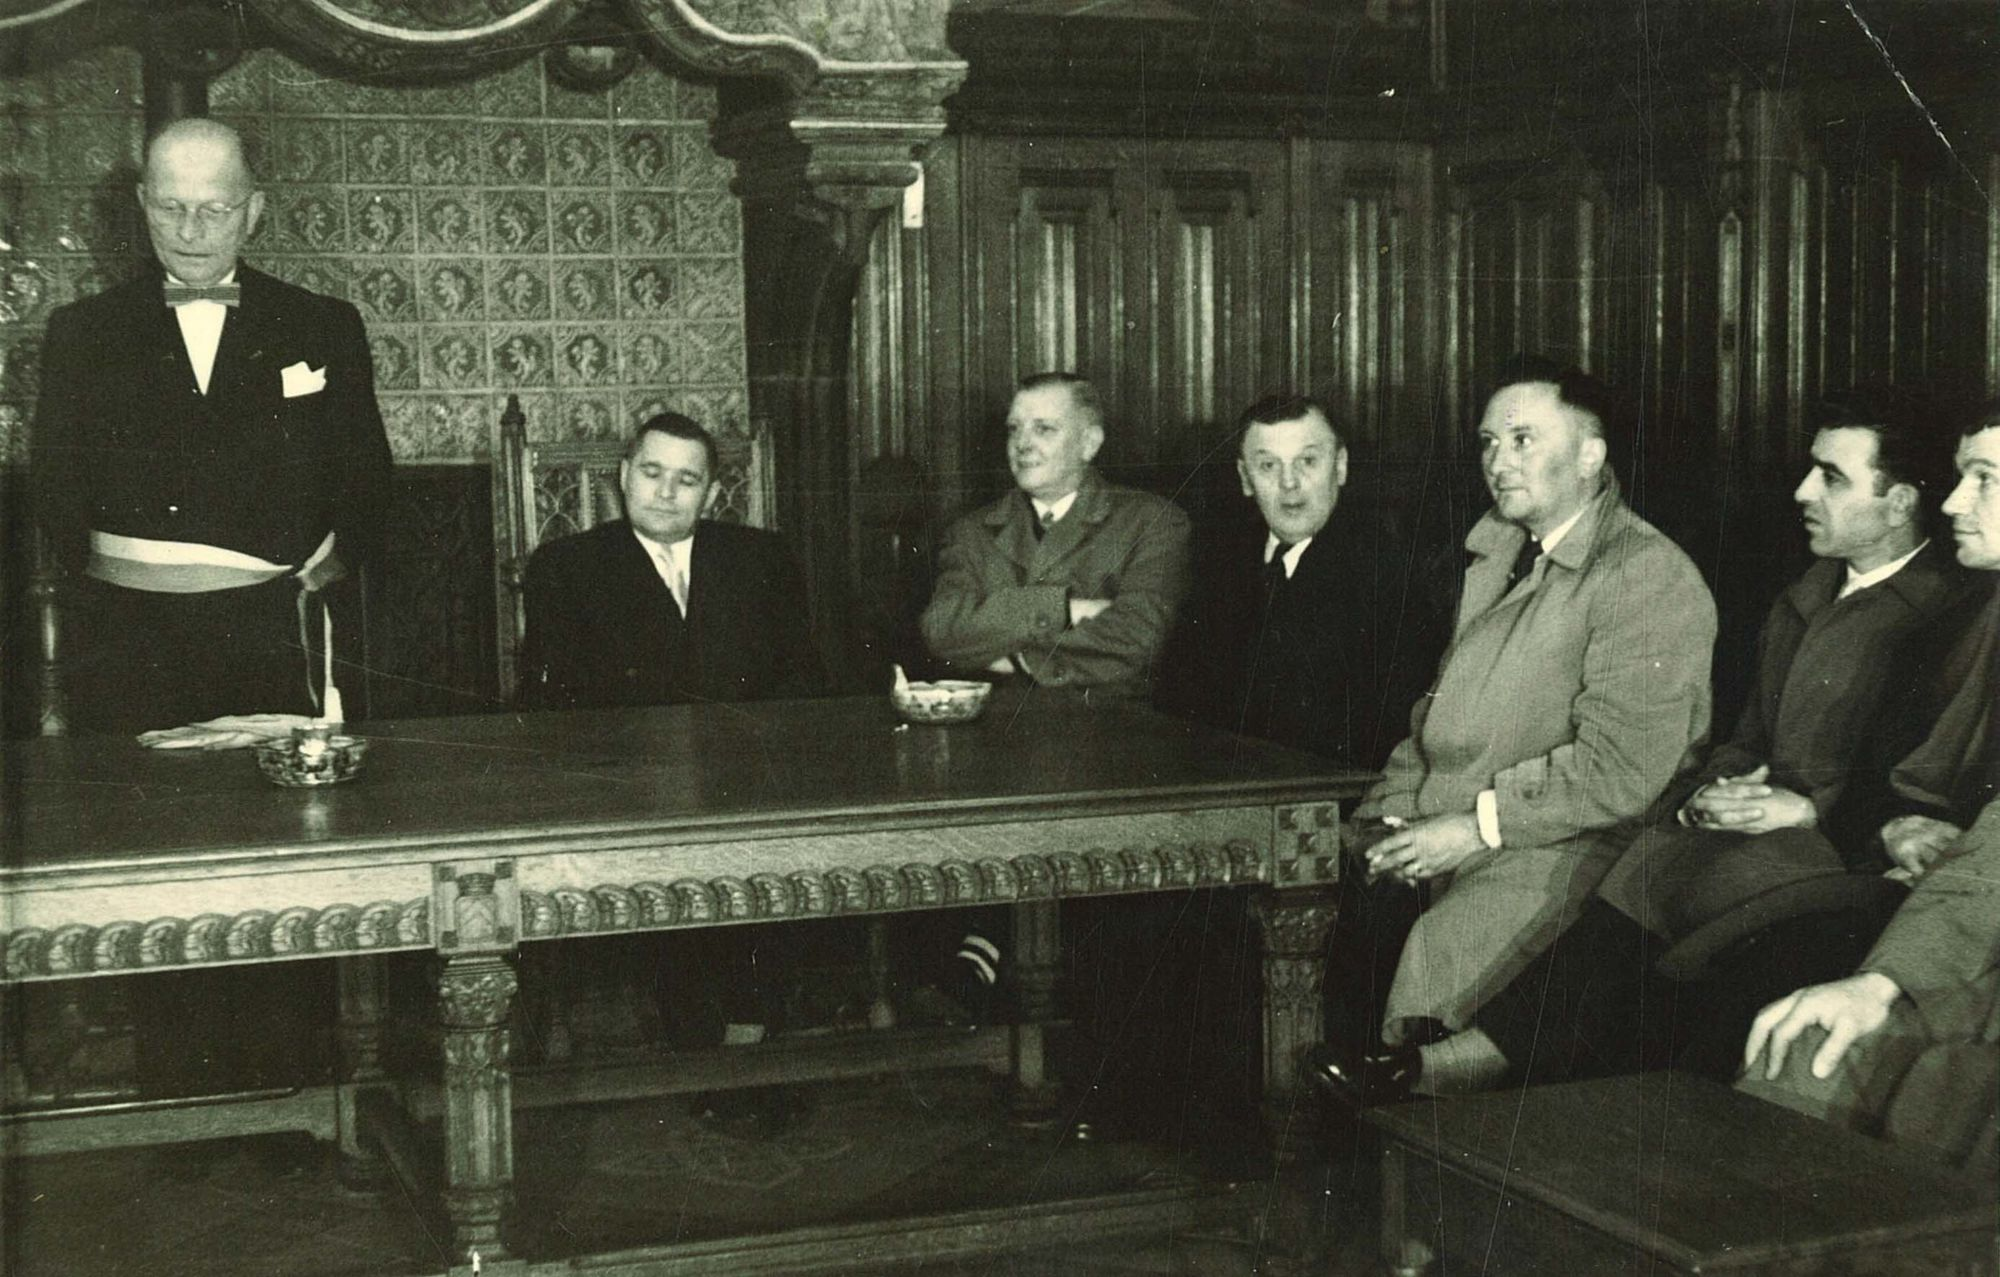 Burgemeester Jules Coussens in het stadhuis